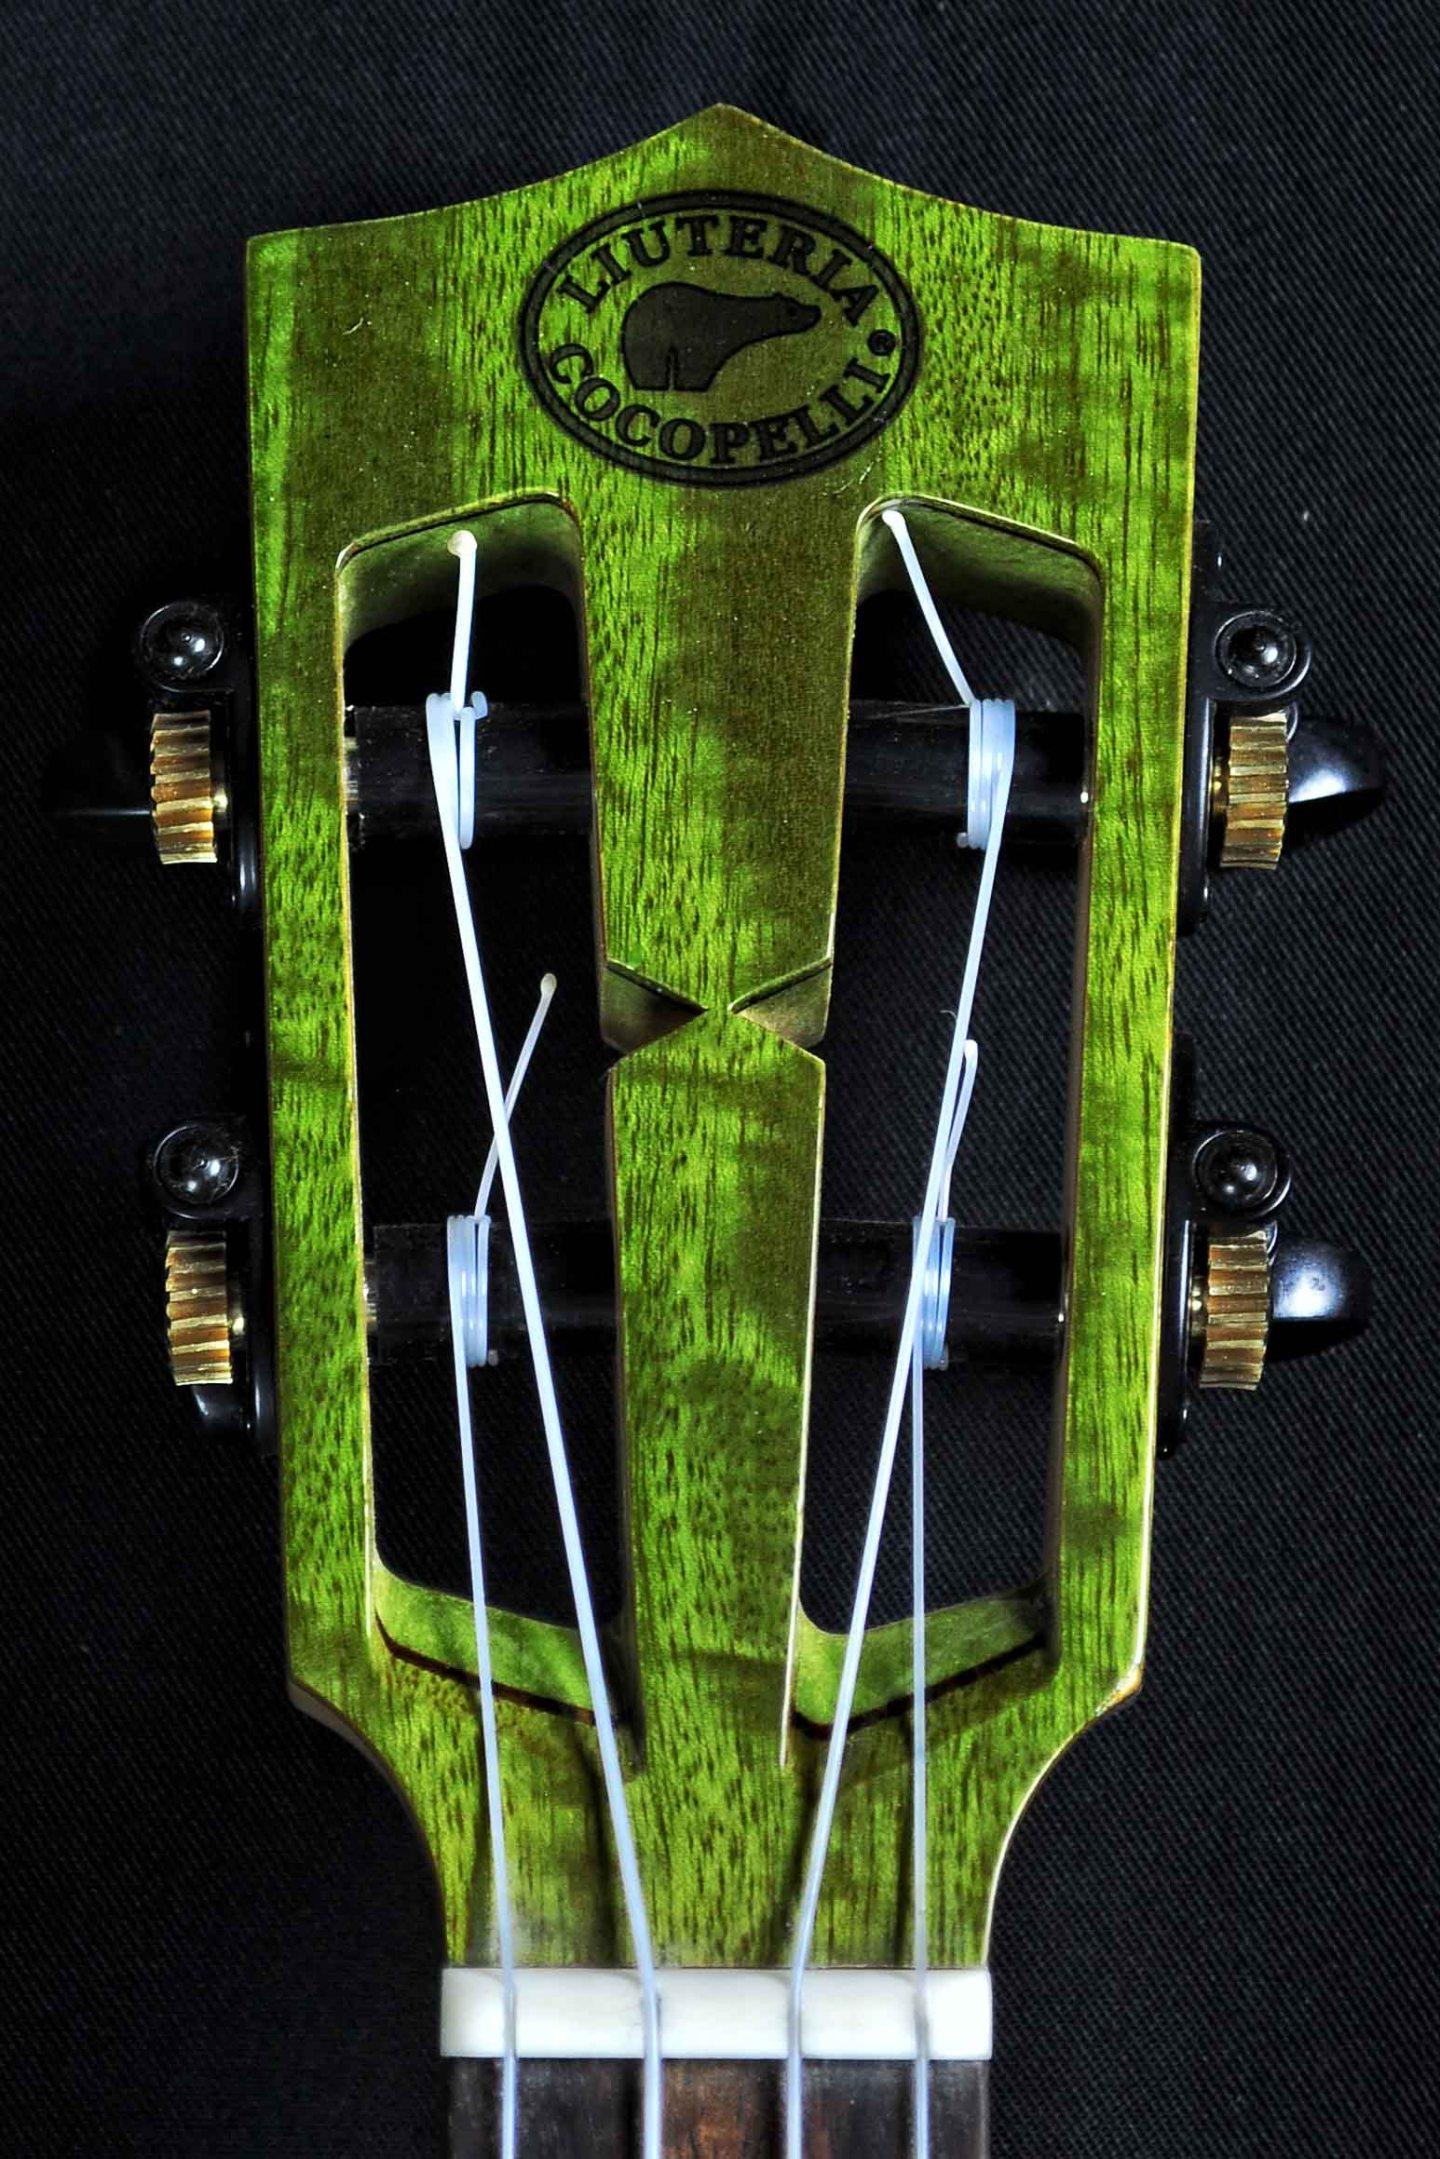 paletta-ukulele-liuteria-cocopelli